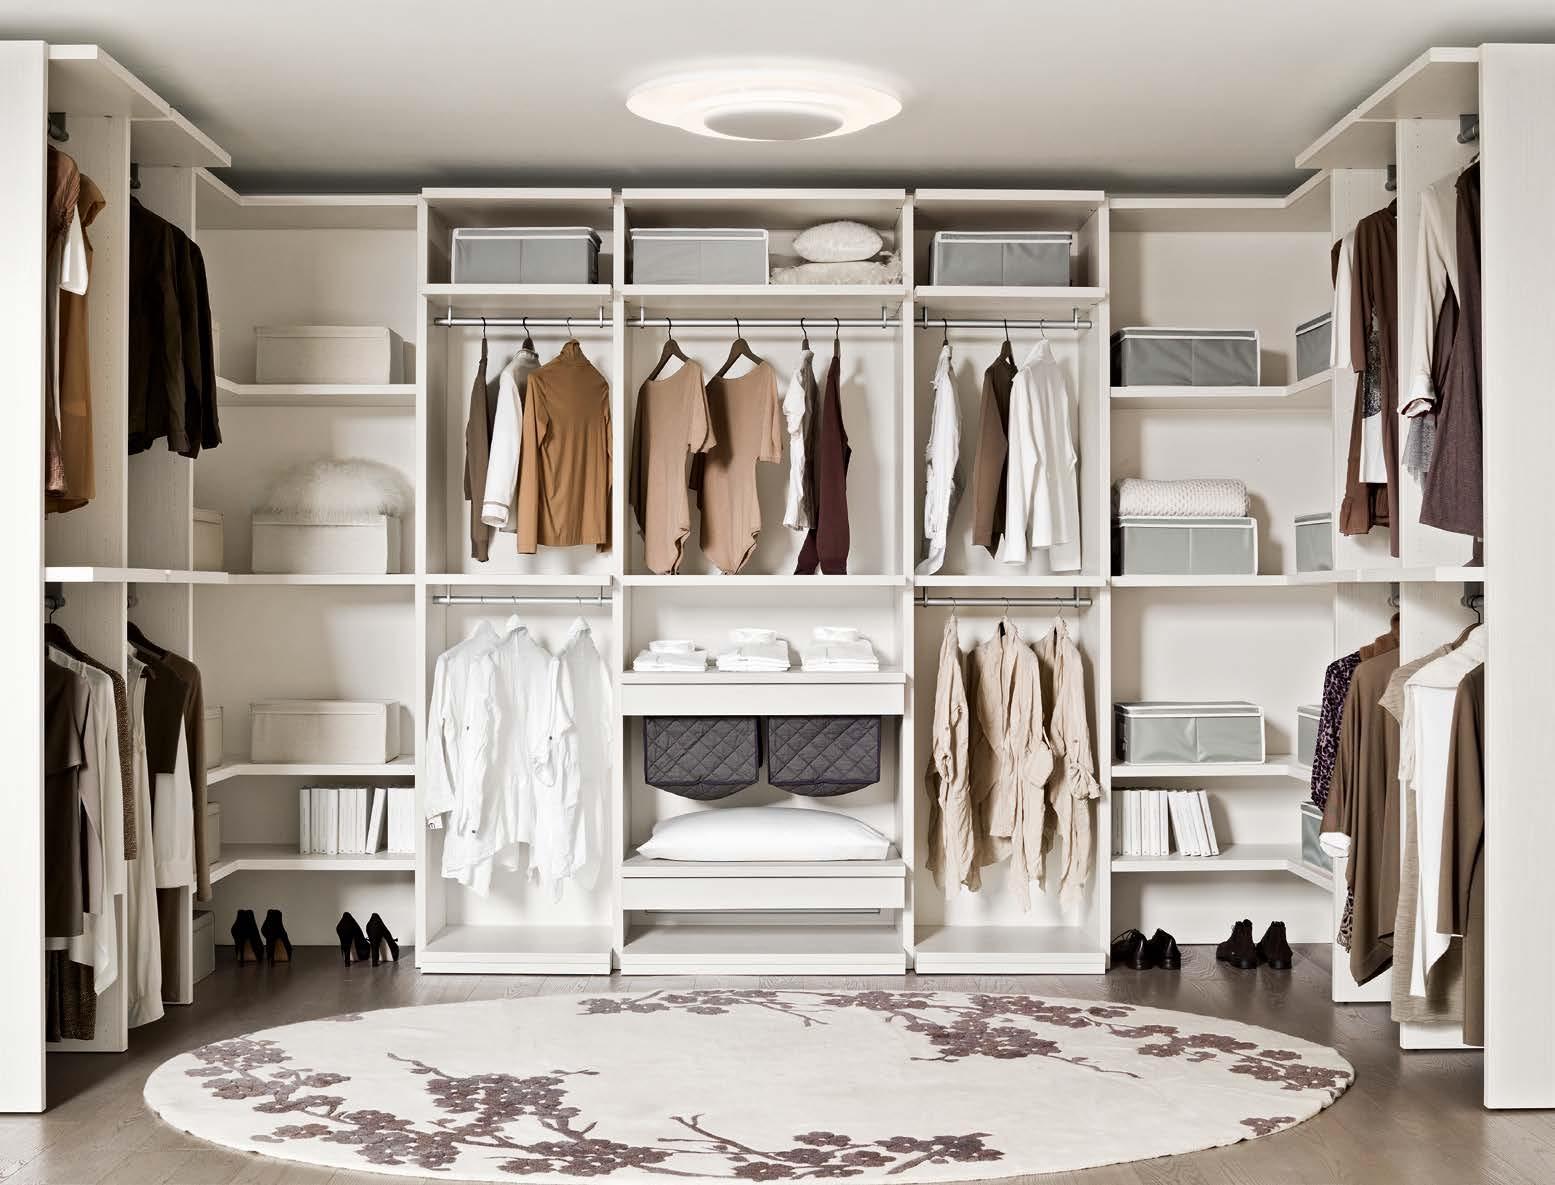 armadio zg mobili cabine armadio moderno laminato materico